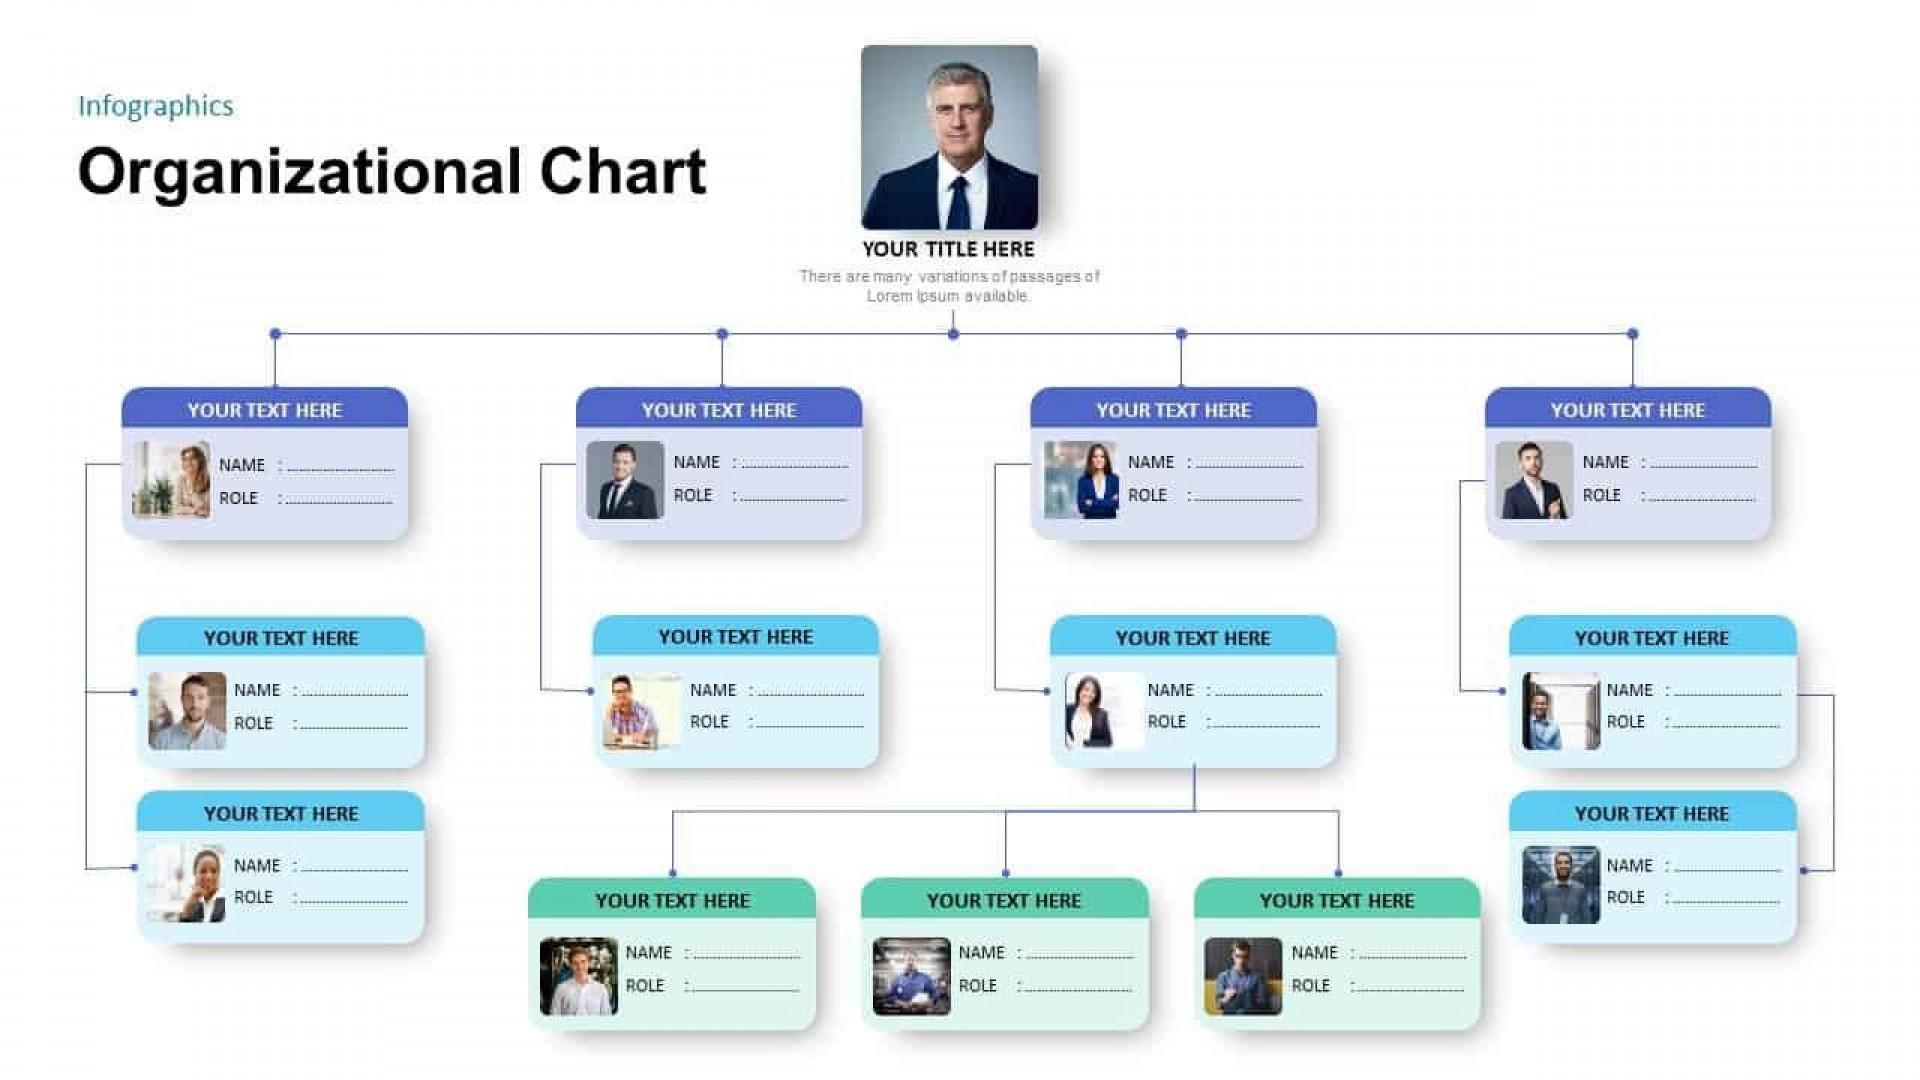 009 Formidable Microsoft Organizational Chart Template High Def  Templates Visio Org M Office Organization Powerpoint1920